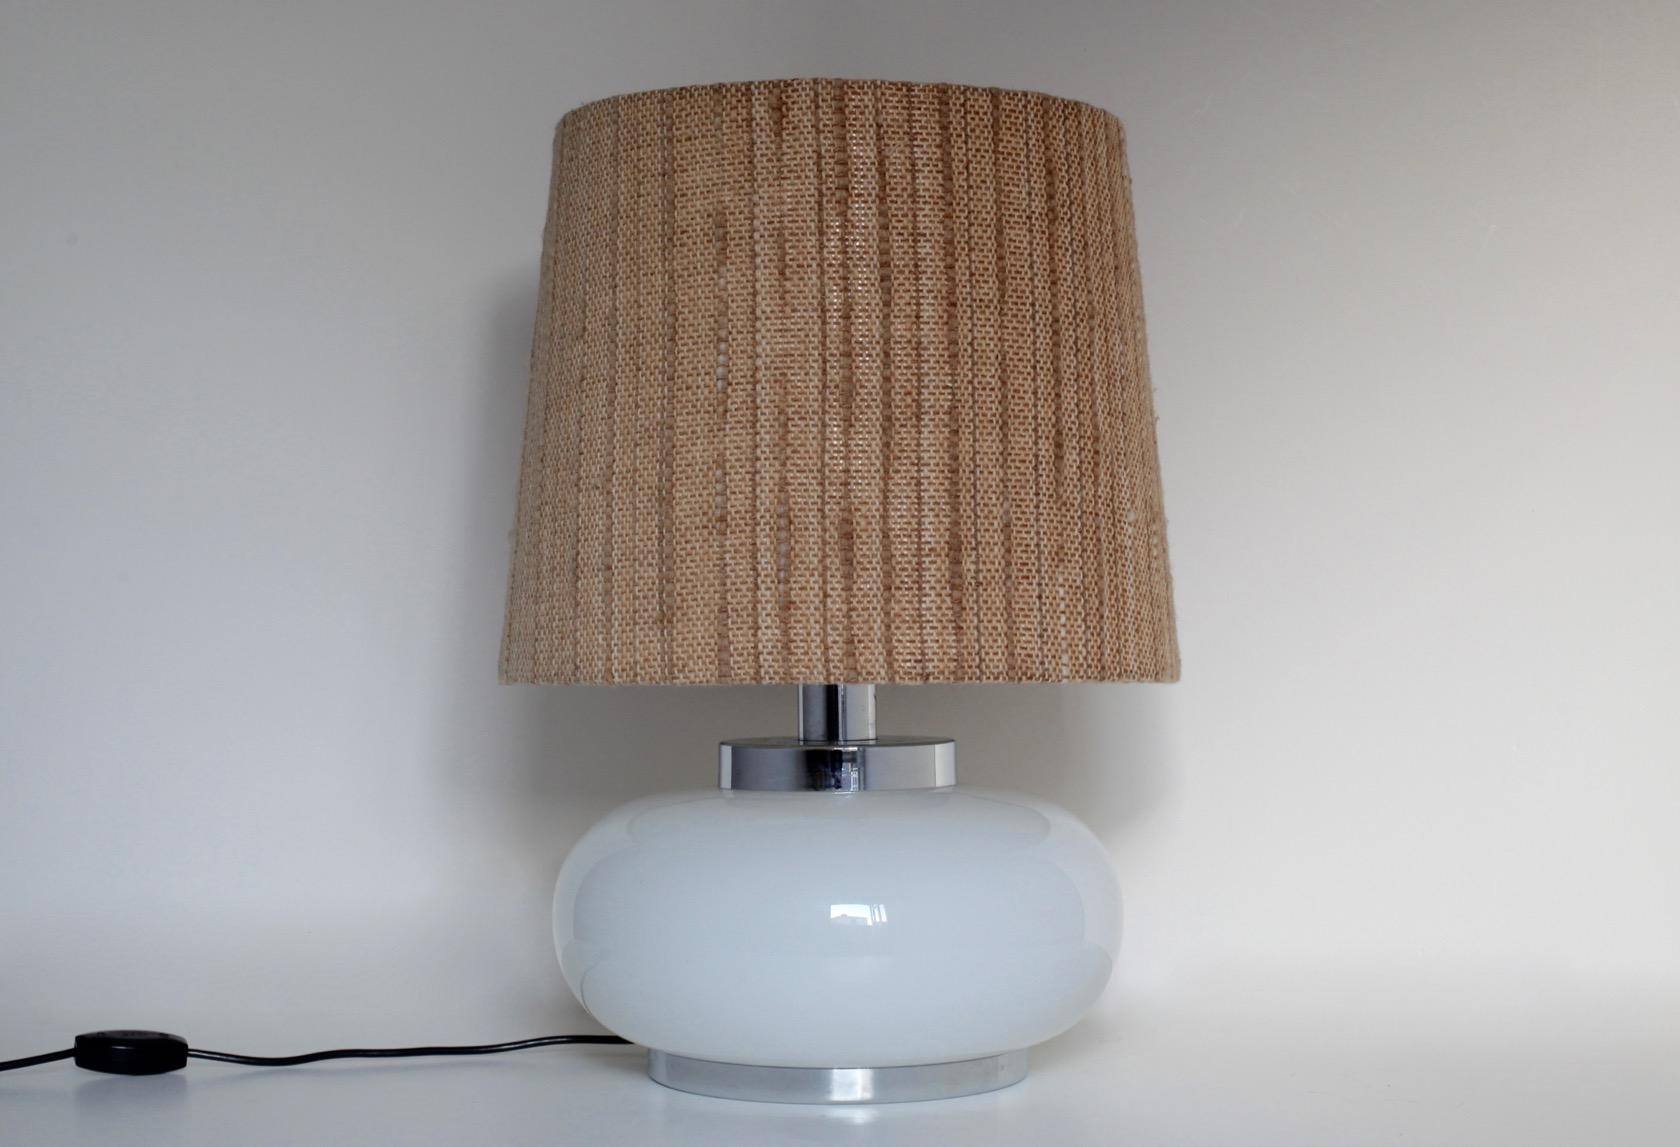 gro e 60ies lampe mit glasfu raumwunder vintage wohnen in n rnberg. Black Bedroom Furniture Sets. Home Design Ideas